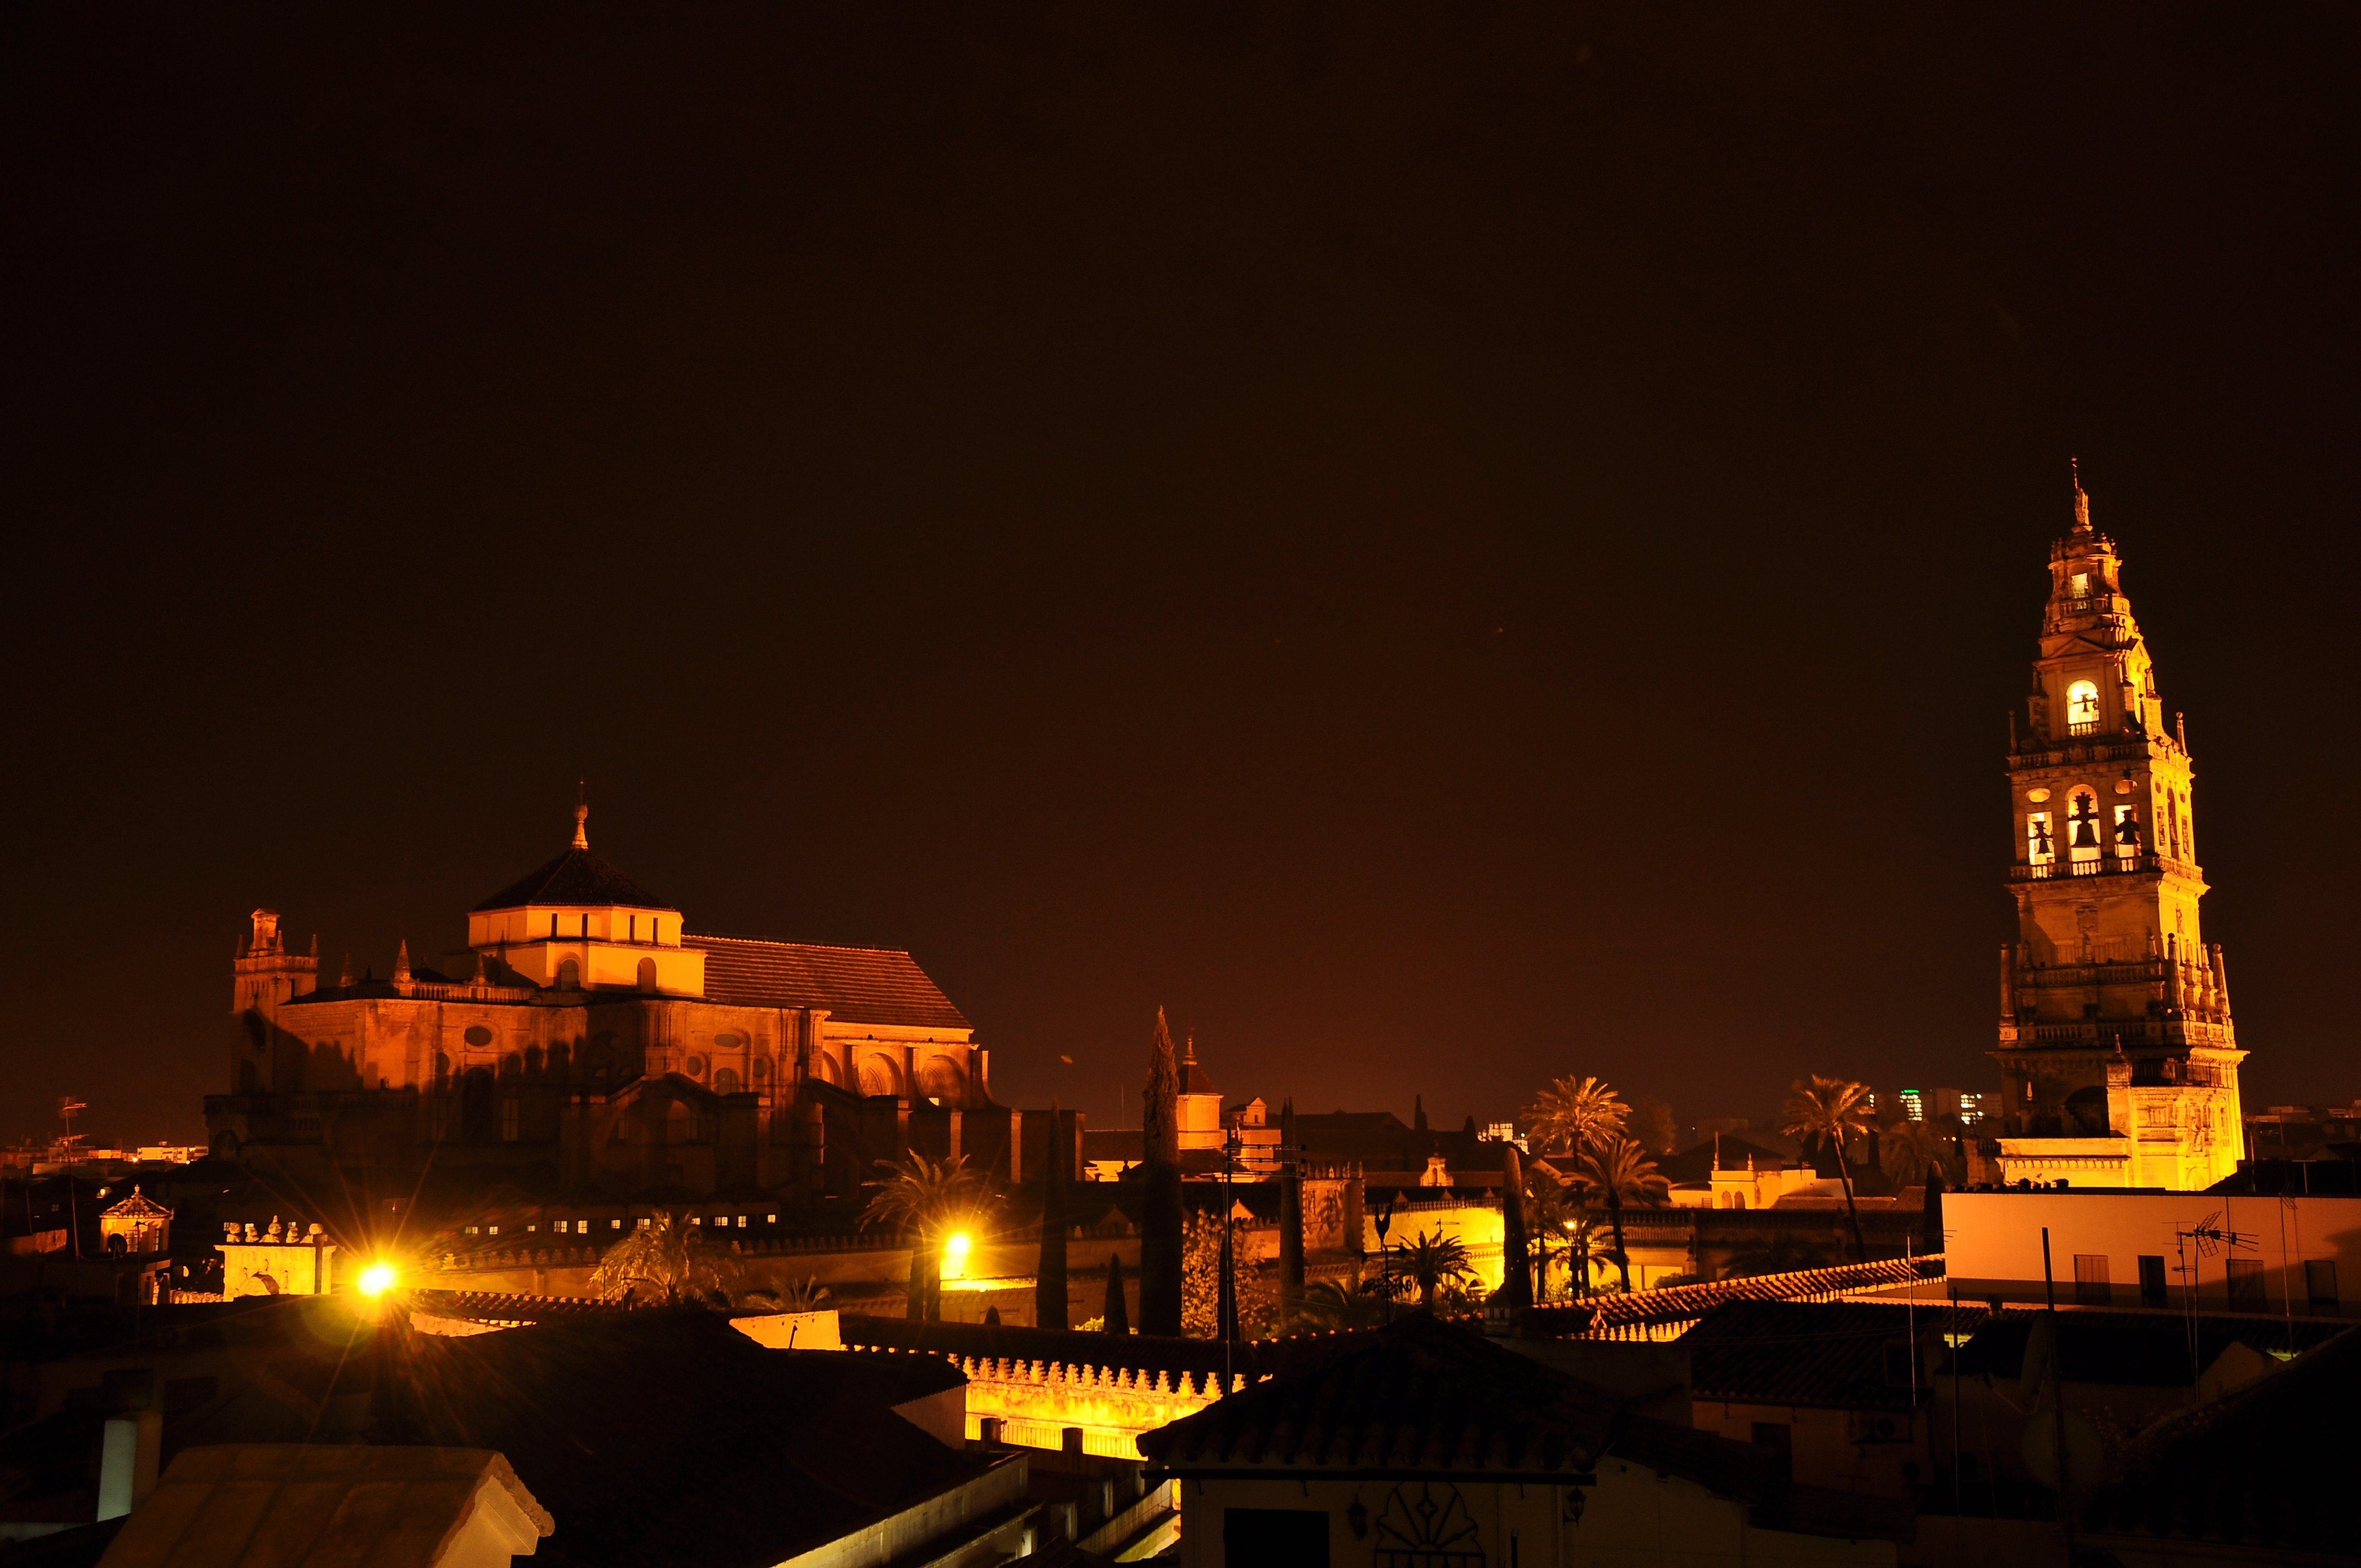 Http Commons Wikimedia Org Wiki File C C3 B3rdoba Spain At Night Jpg